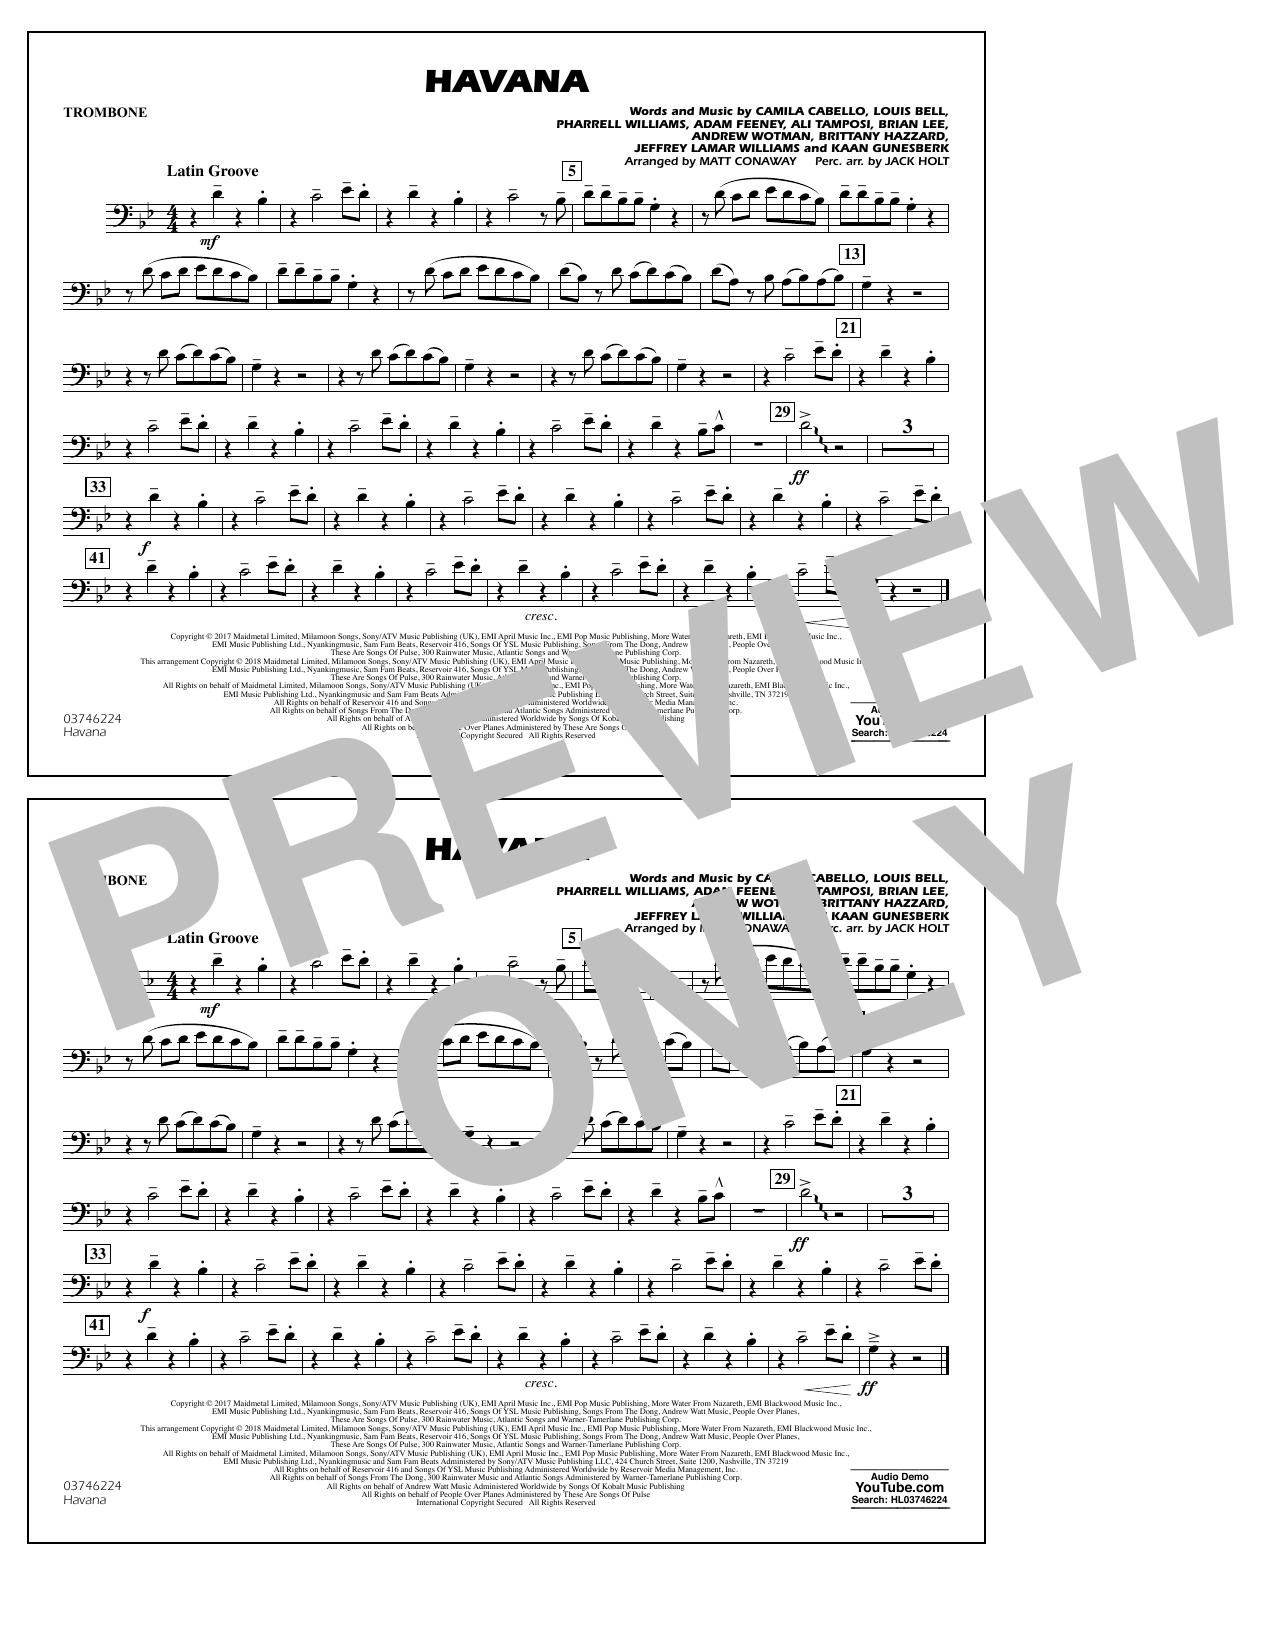 Matt Conaway Havana - Trombone sheet music notes and chords. Download Printable PDF.